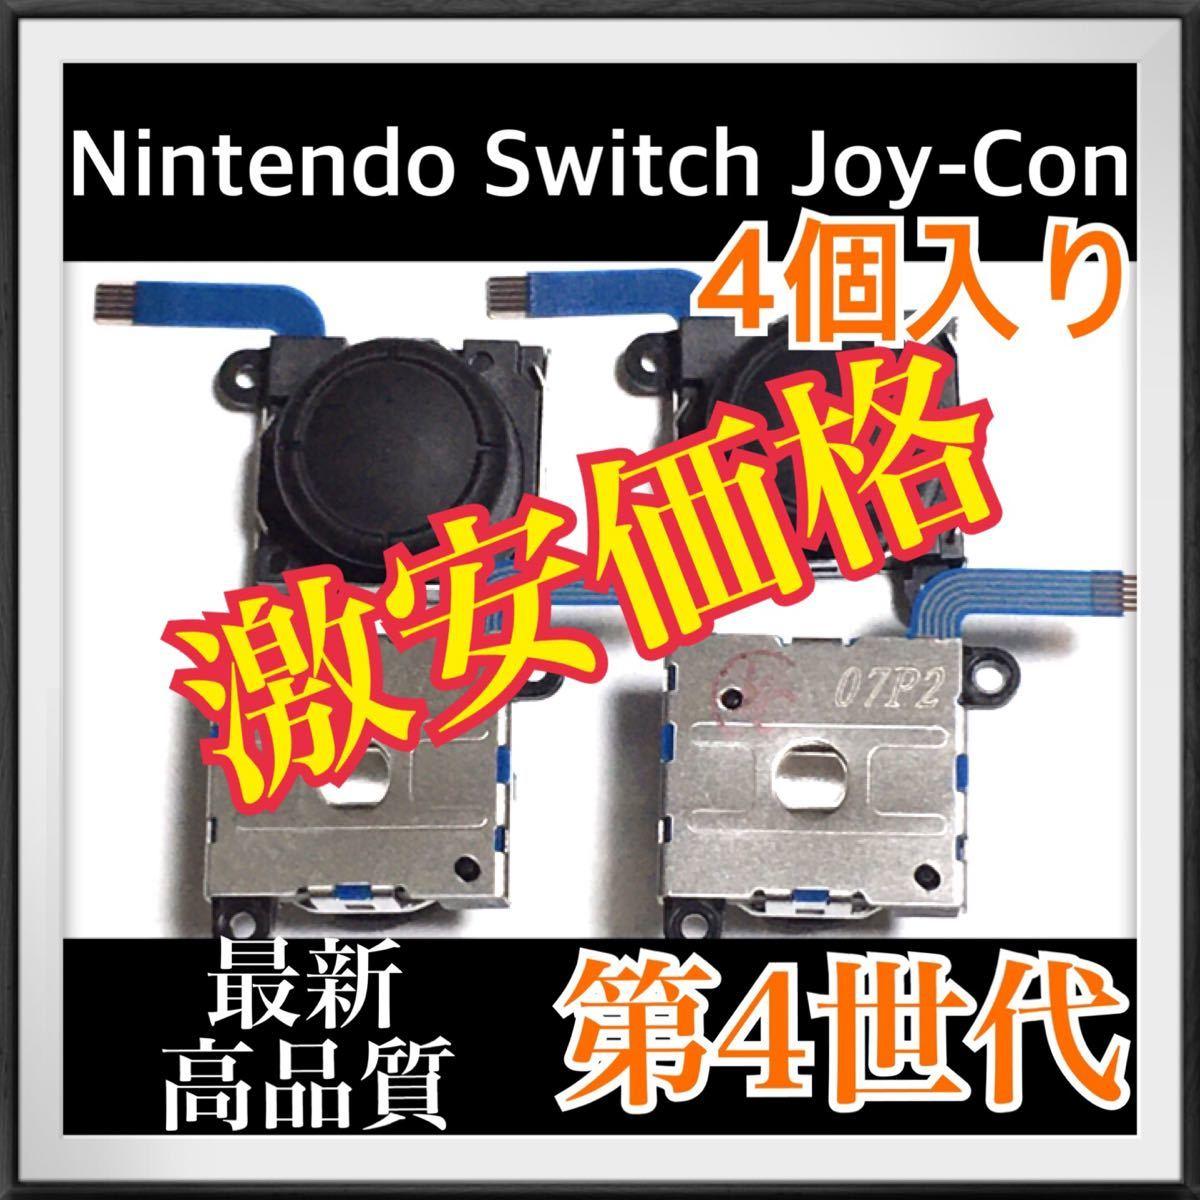 Nintendo Switch Joy-Con スティック 4個入り